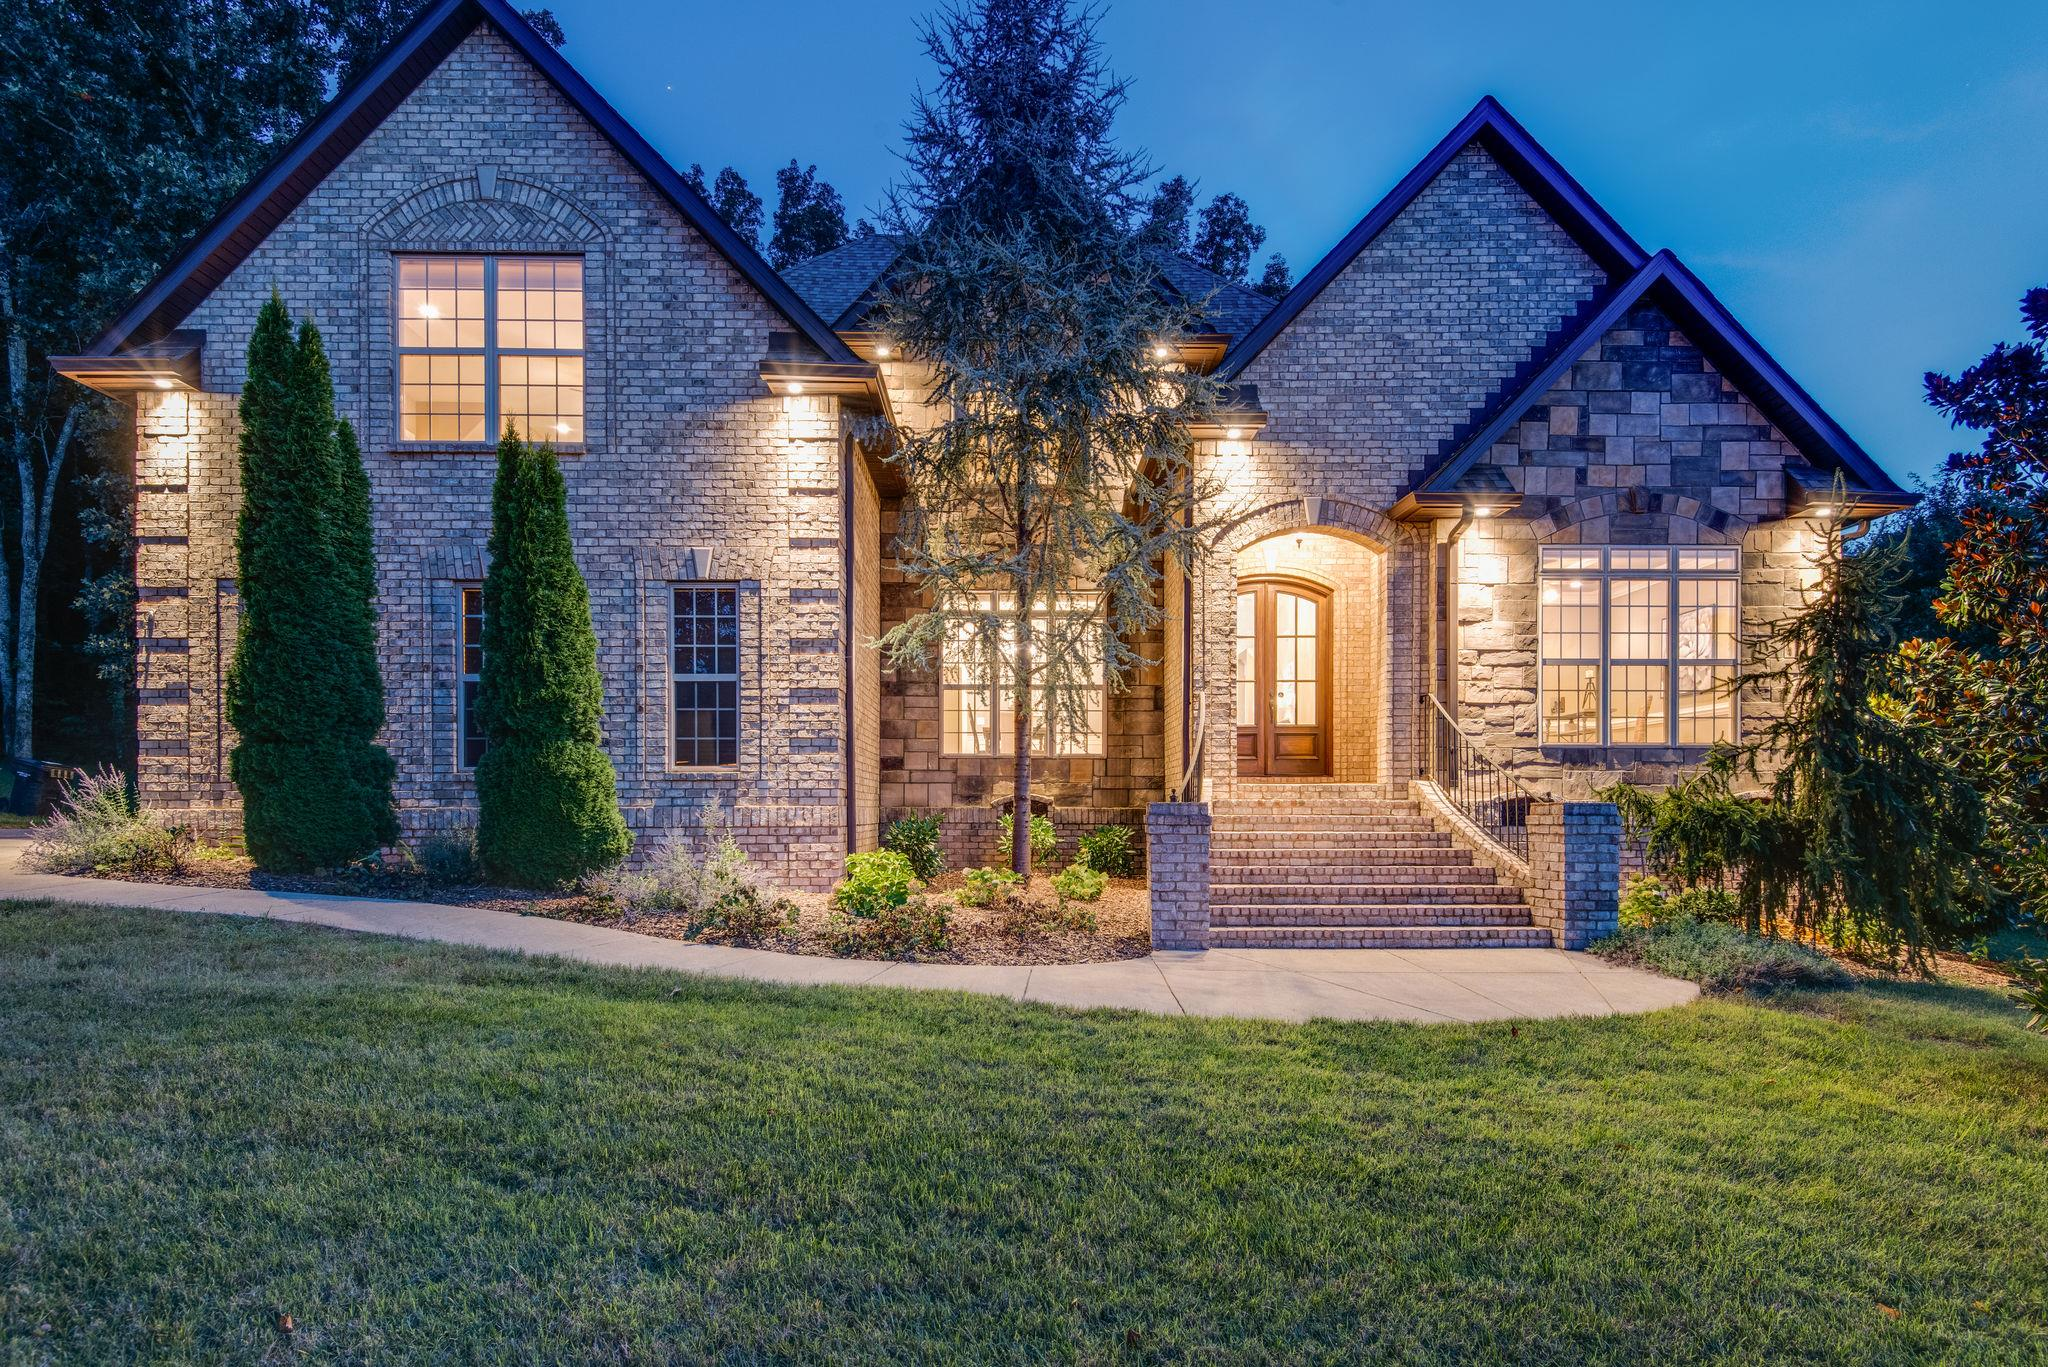 143 Ridgebend Dr, Murfreesboro, TN 37128 - Murfreesboro, TN real estate listing